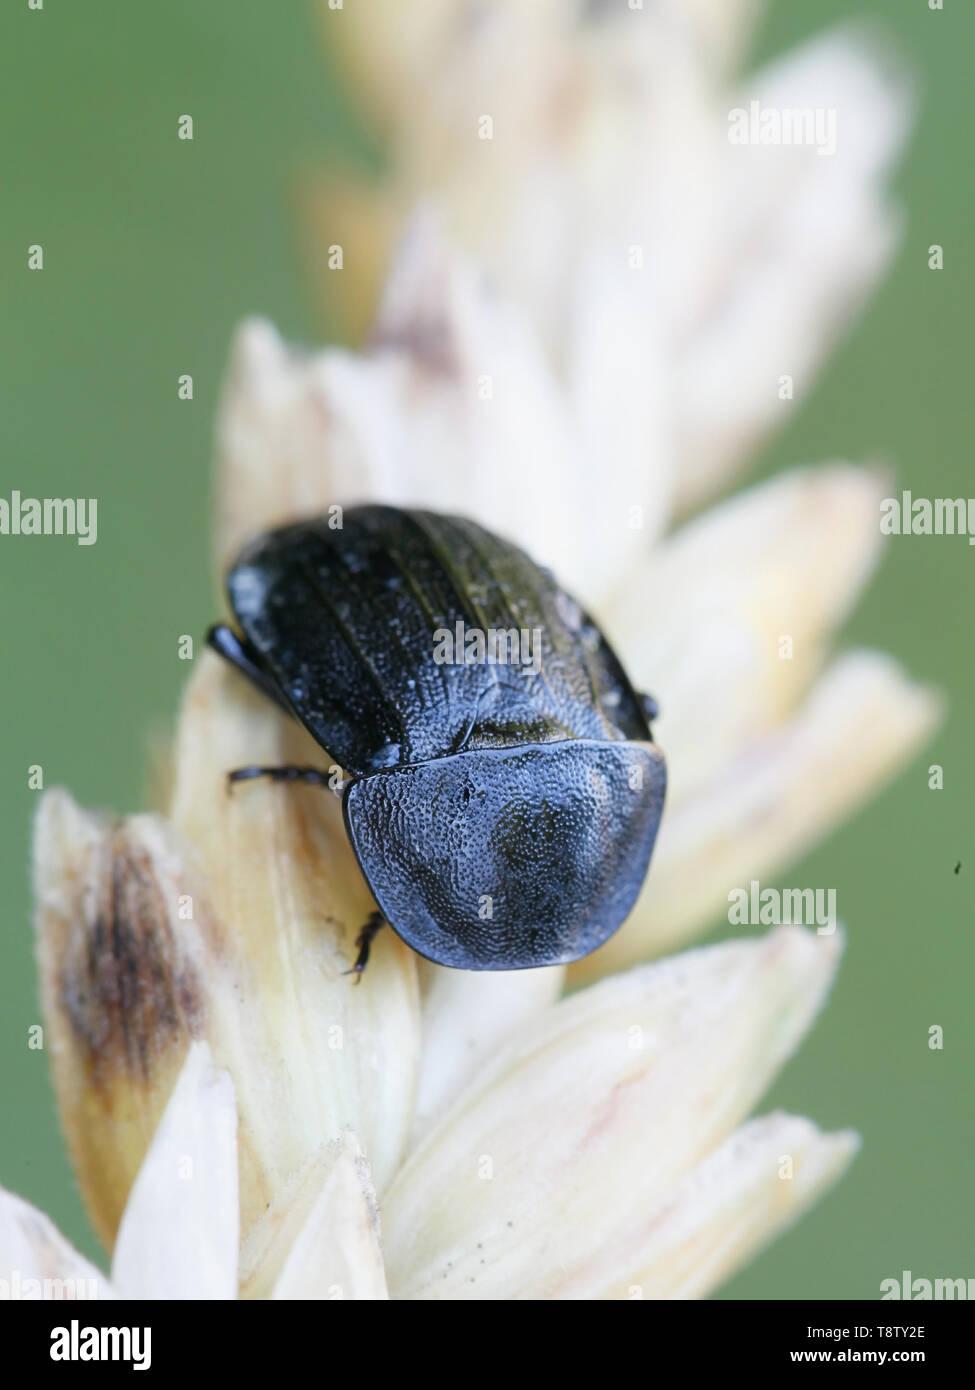 Phosphuga atrata, European carrion beetle - Stock Image